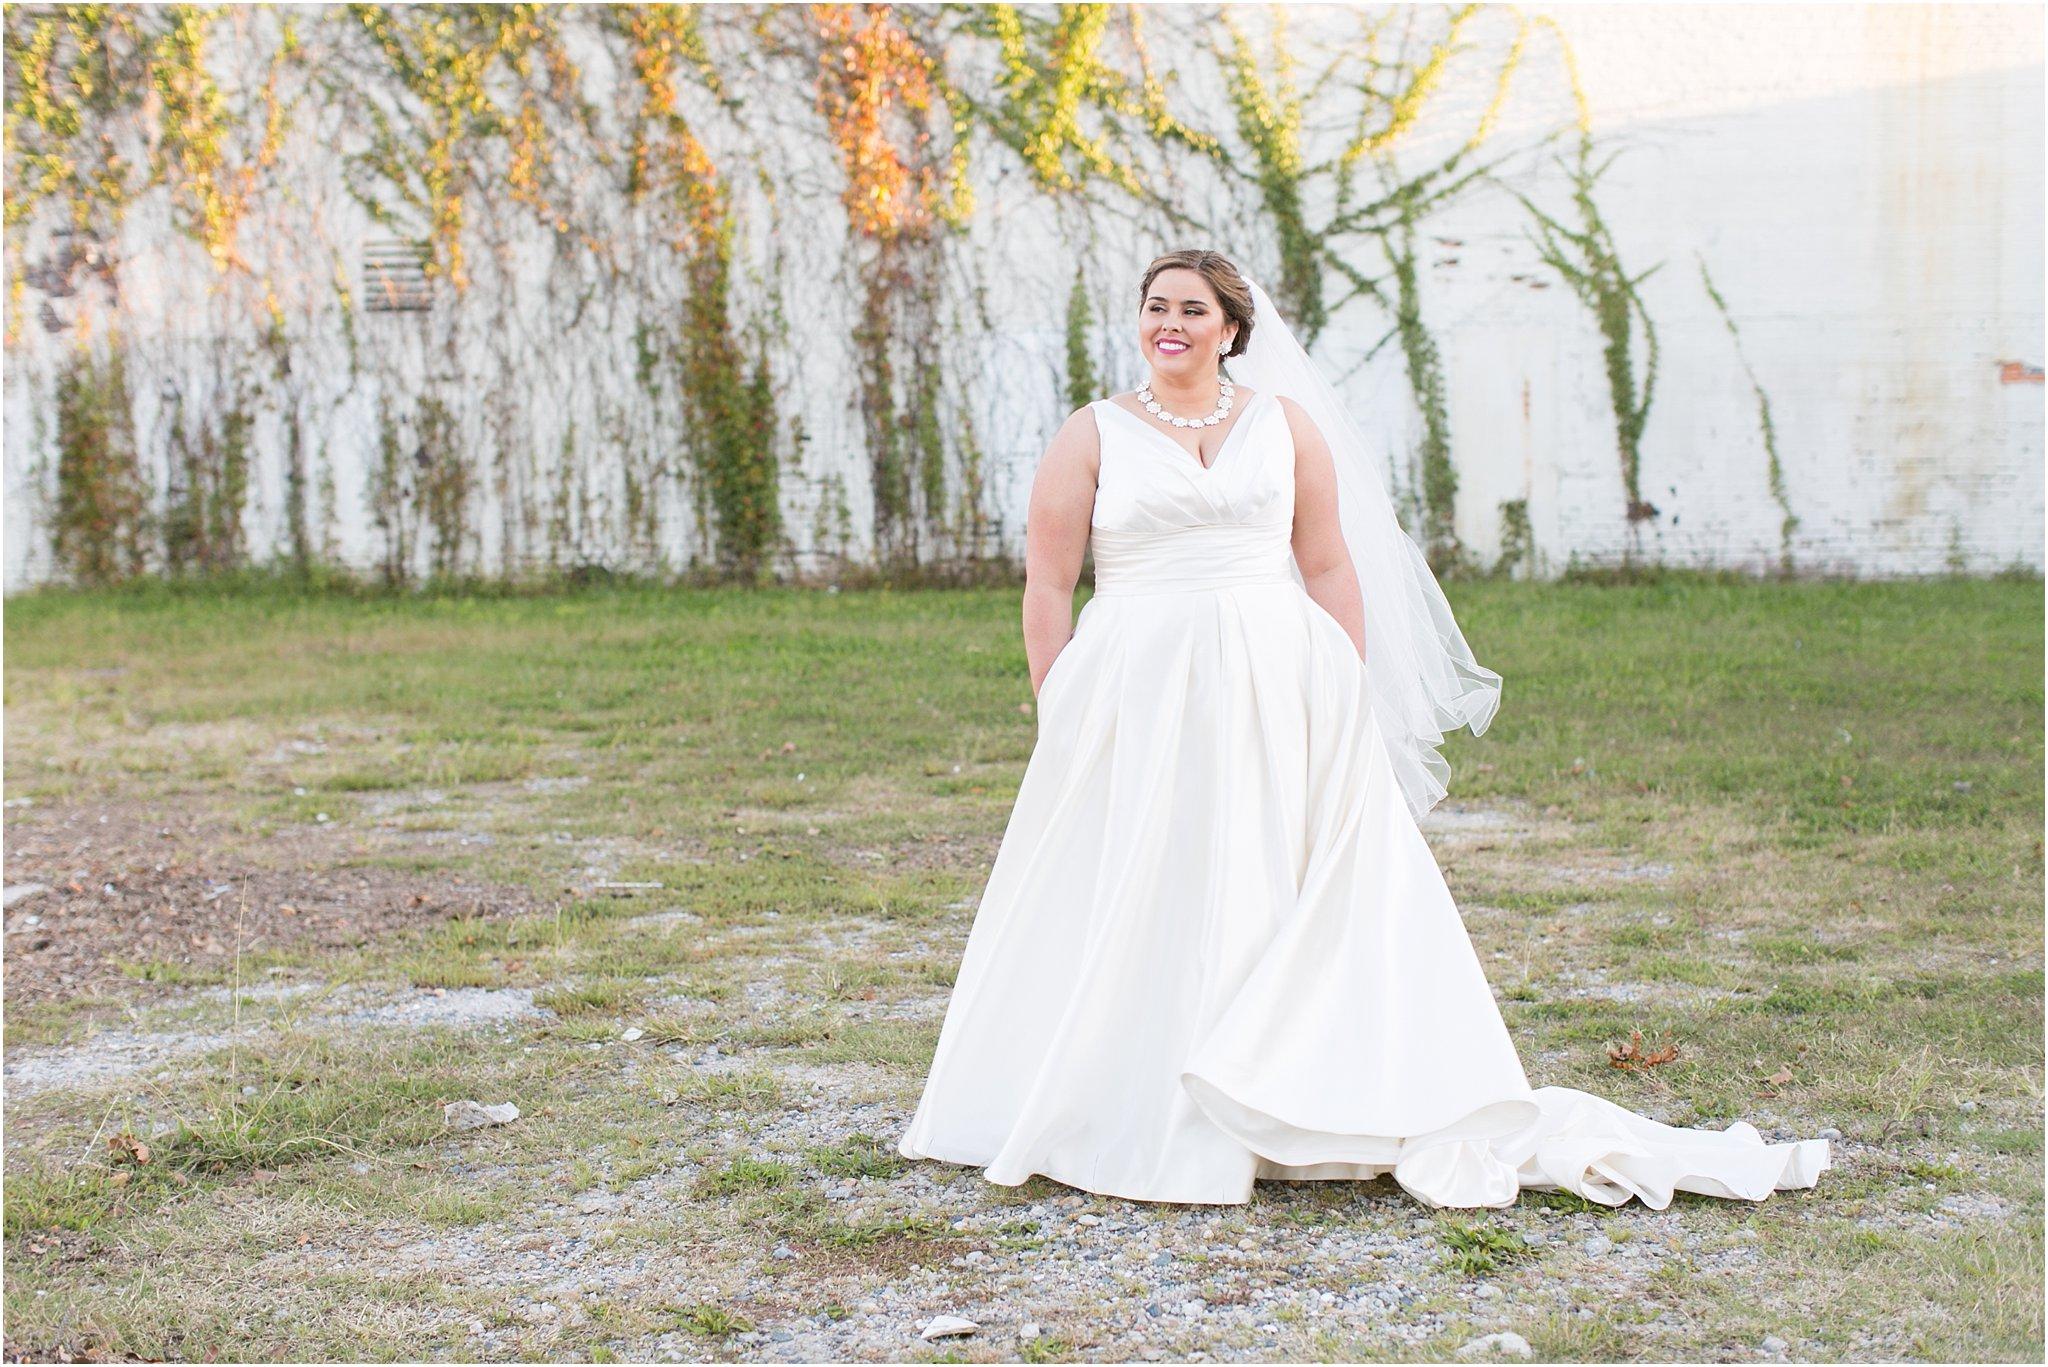 va_jessica_ryan_photography_virginia_wedding_norfolk_harrison_opera_house_norfolk_arts_district_portraits_3822